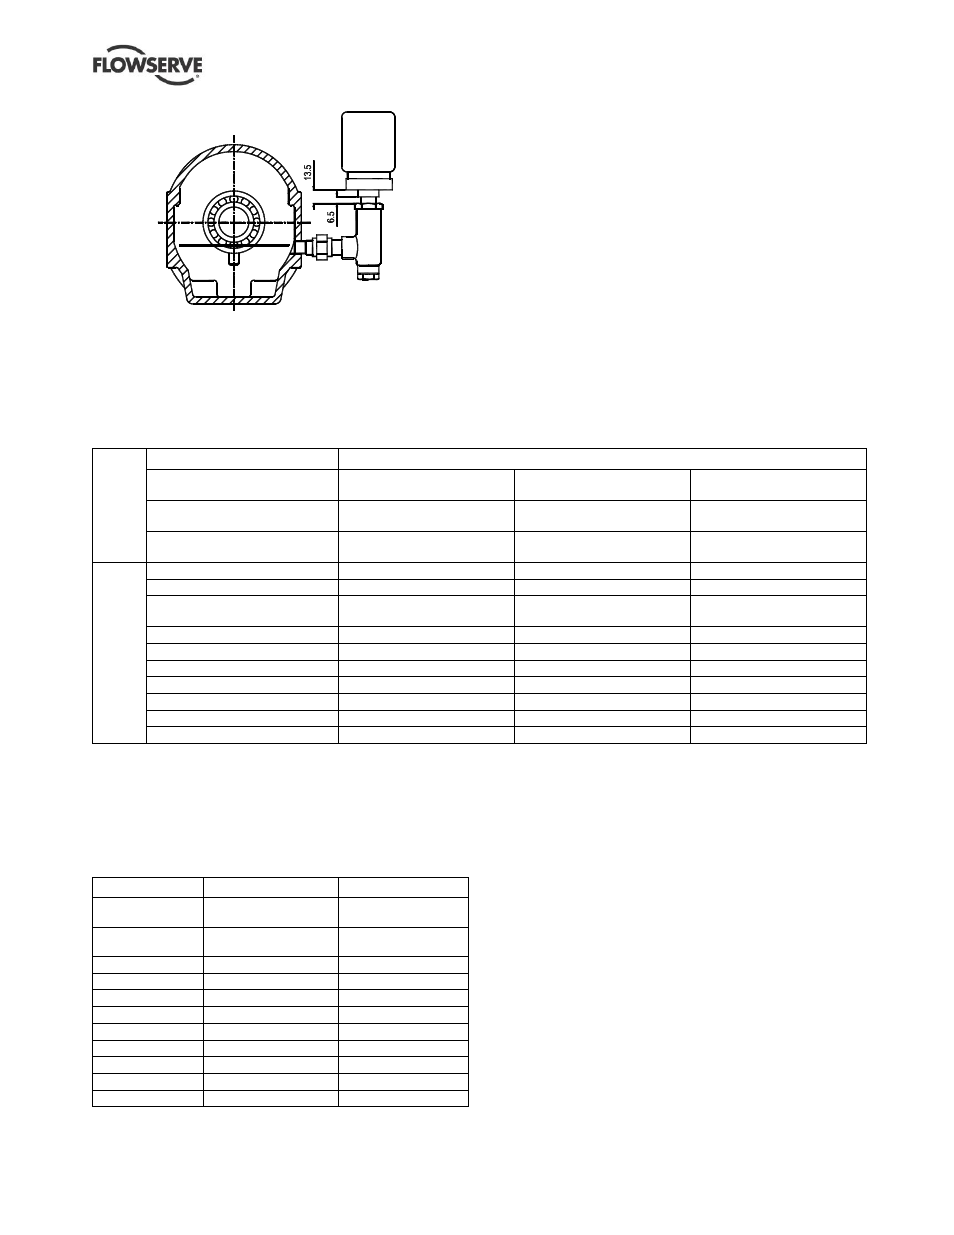 2 pump lubricants | Flowserve WPG IDP User Manual | Page 16 / 40